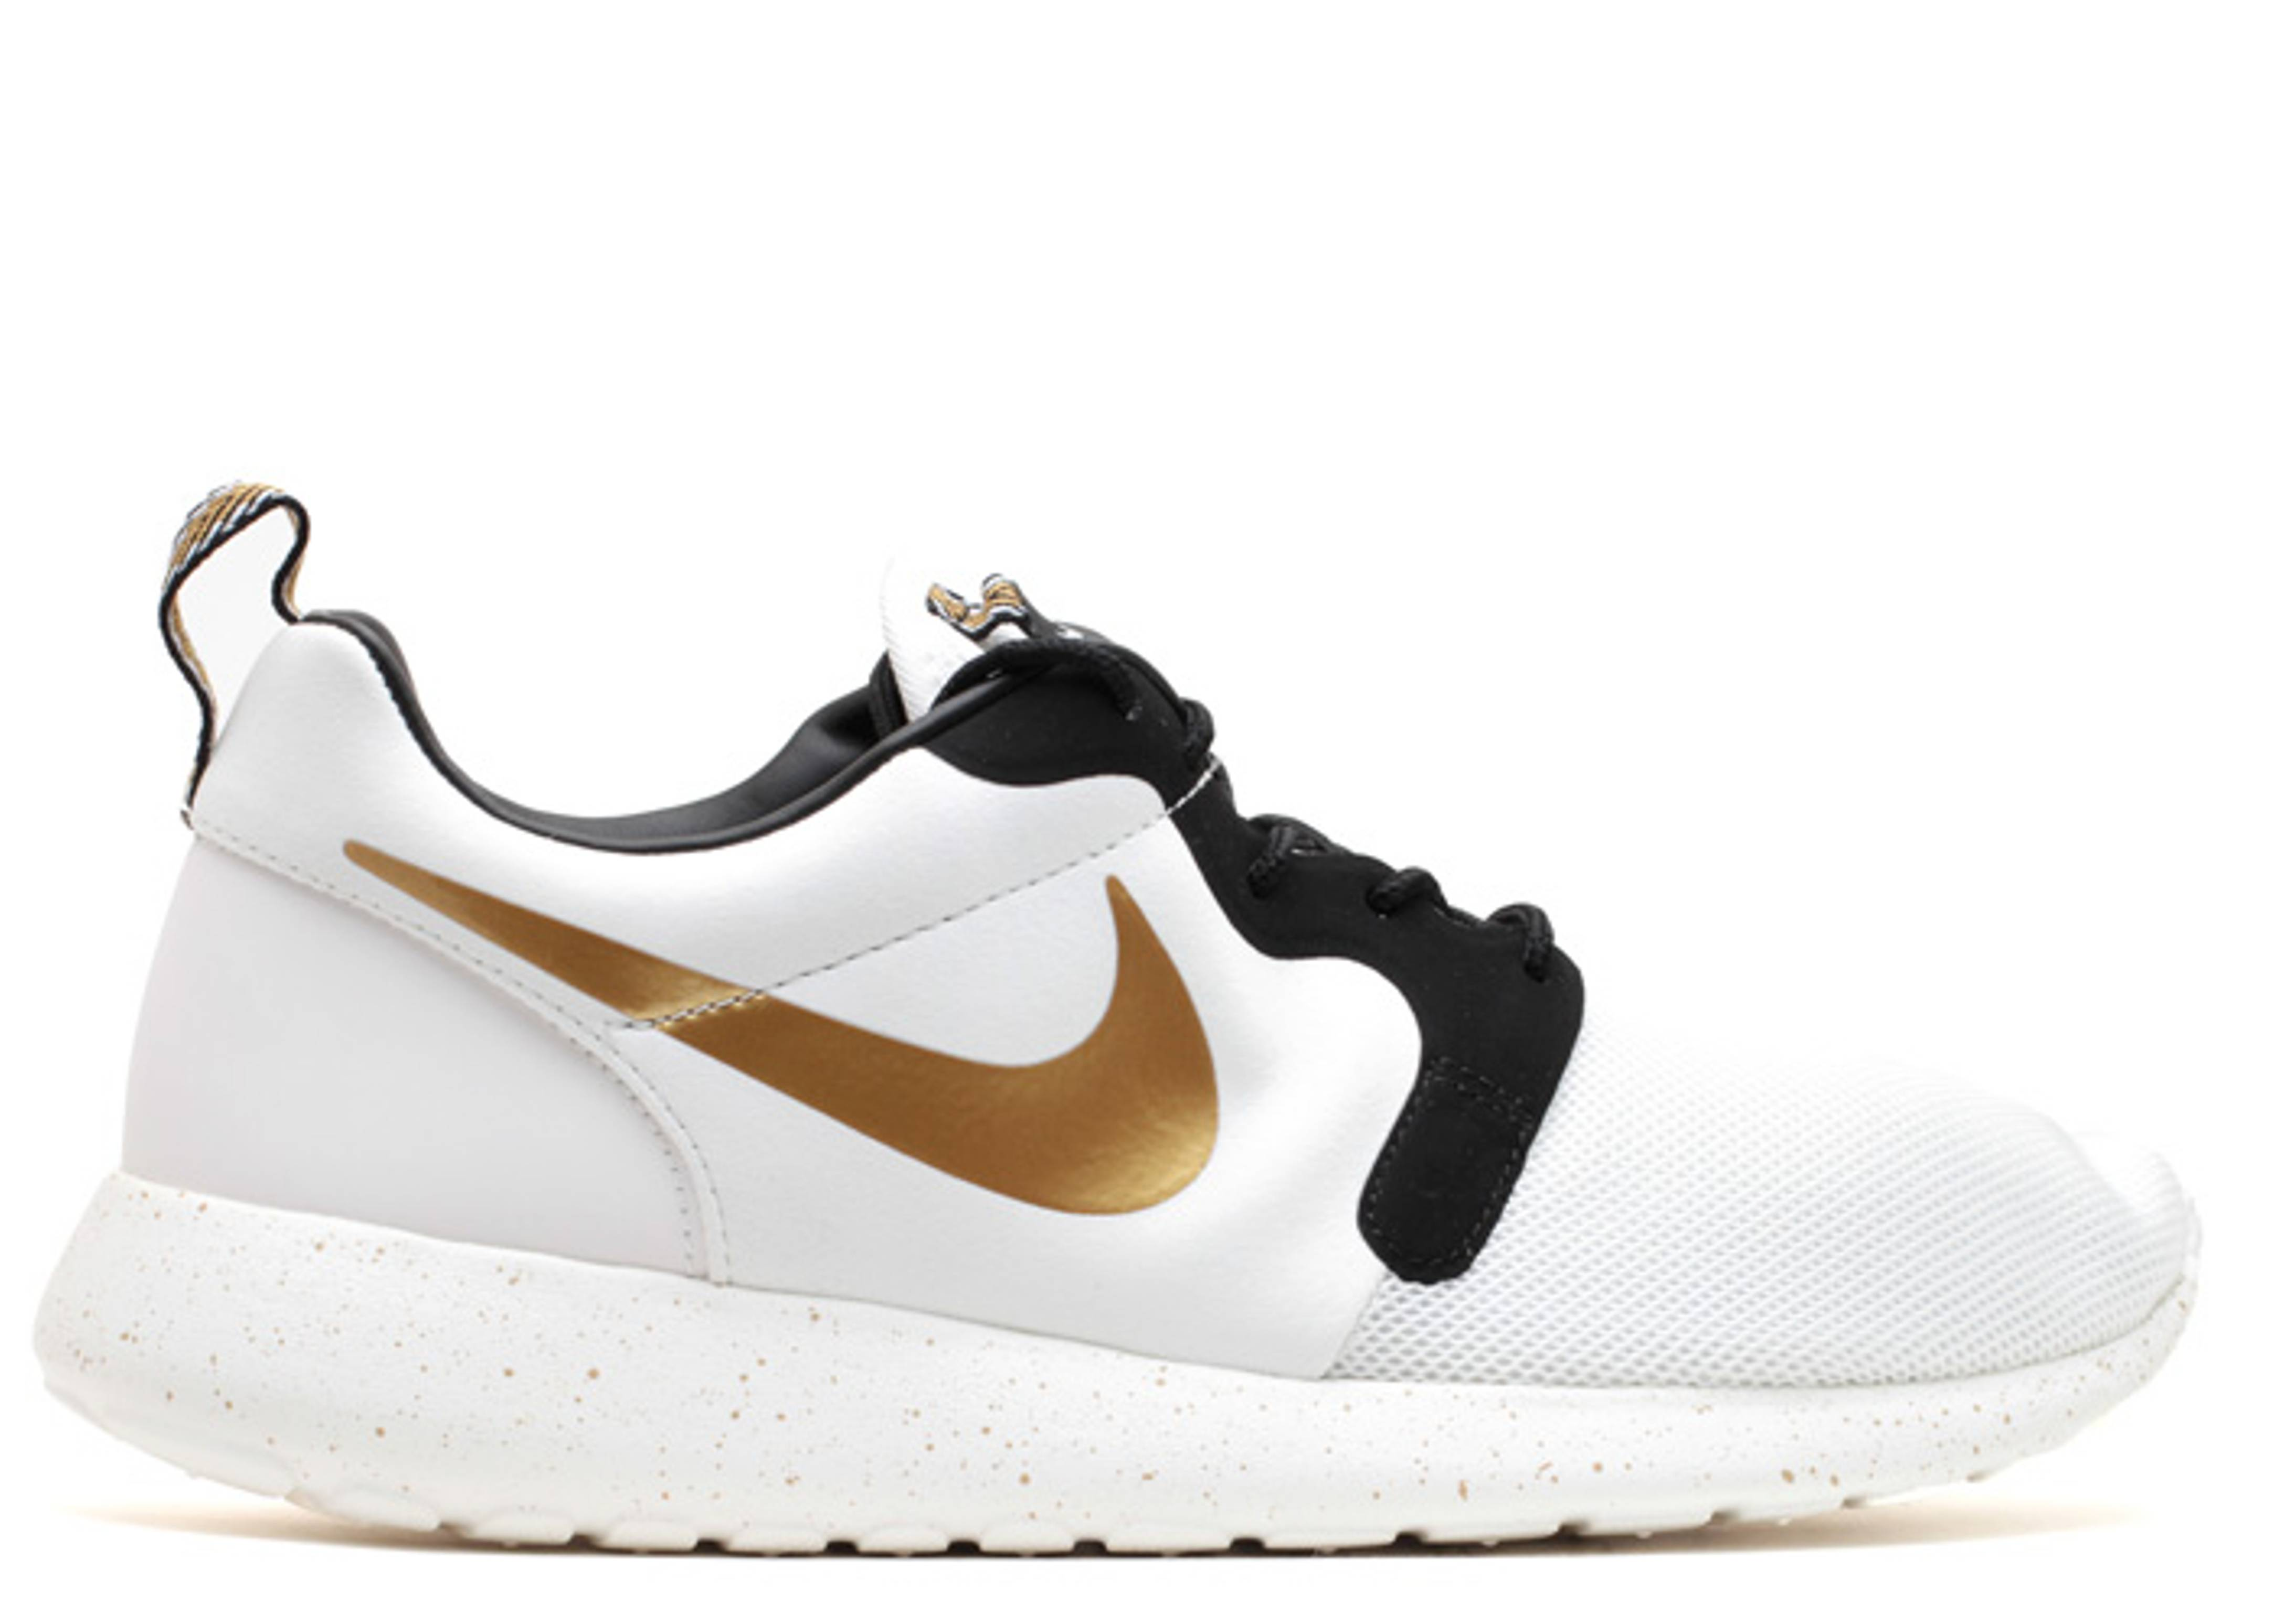 Nike Roshe Run Hyperfuse Gold Trophy For Sale